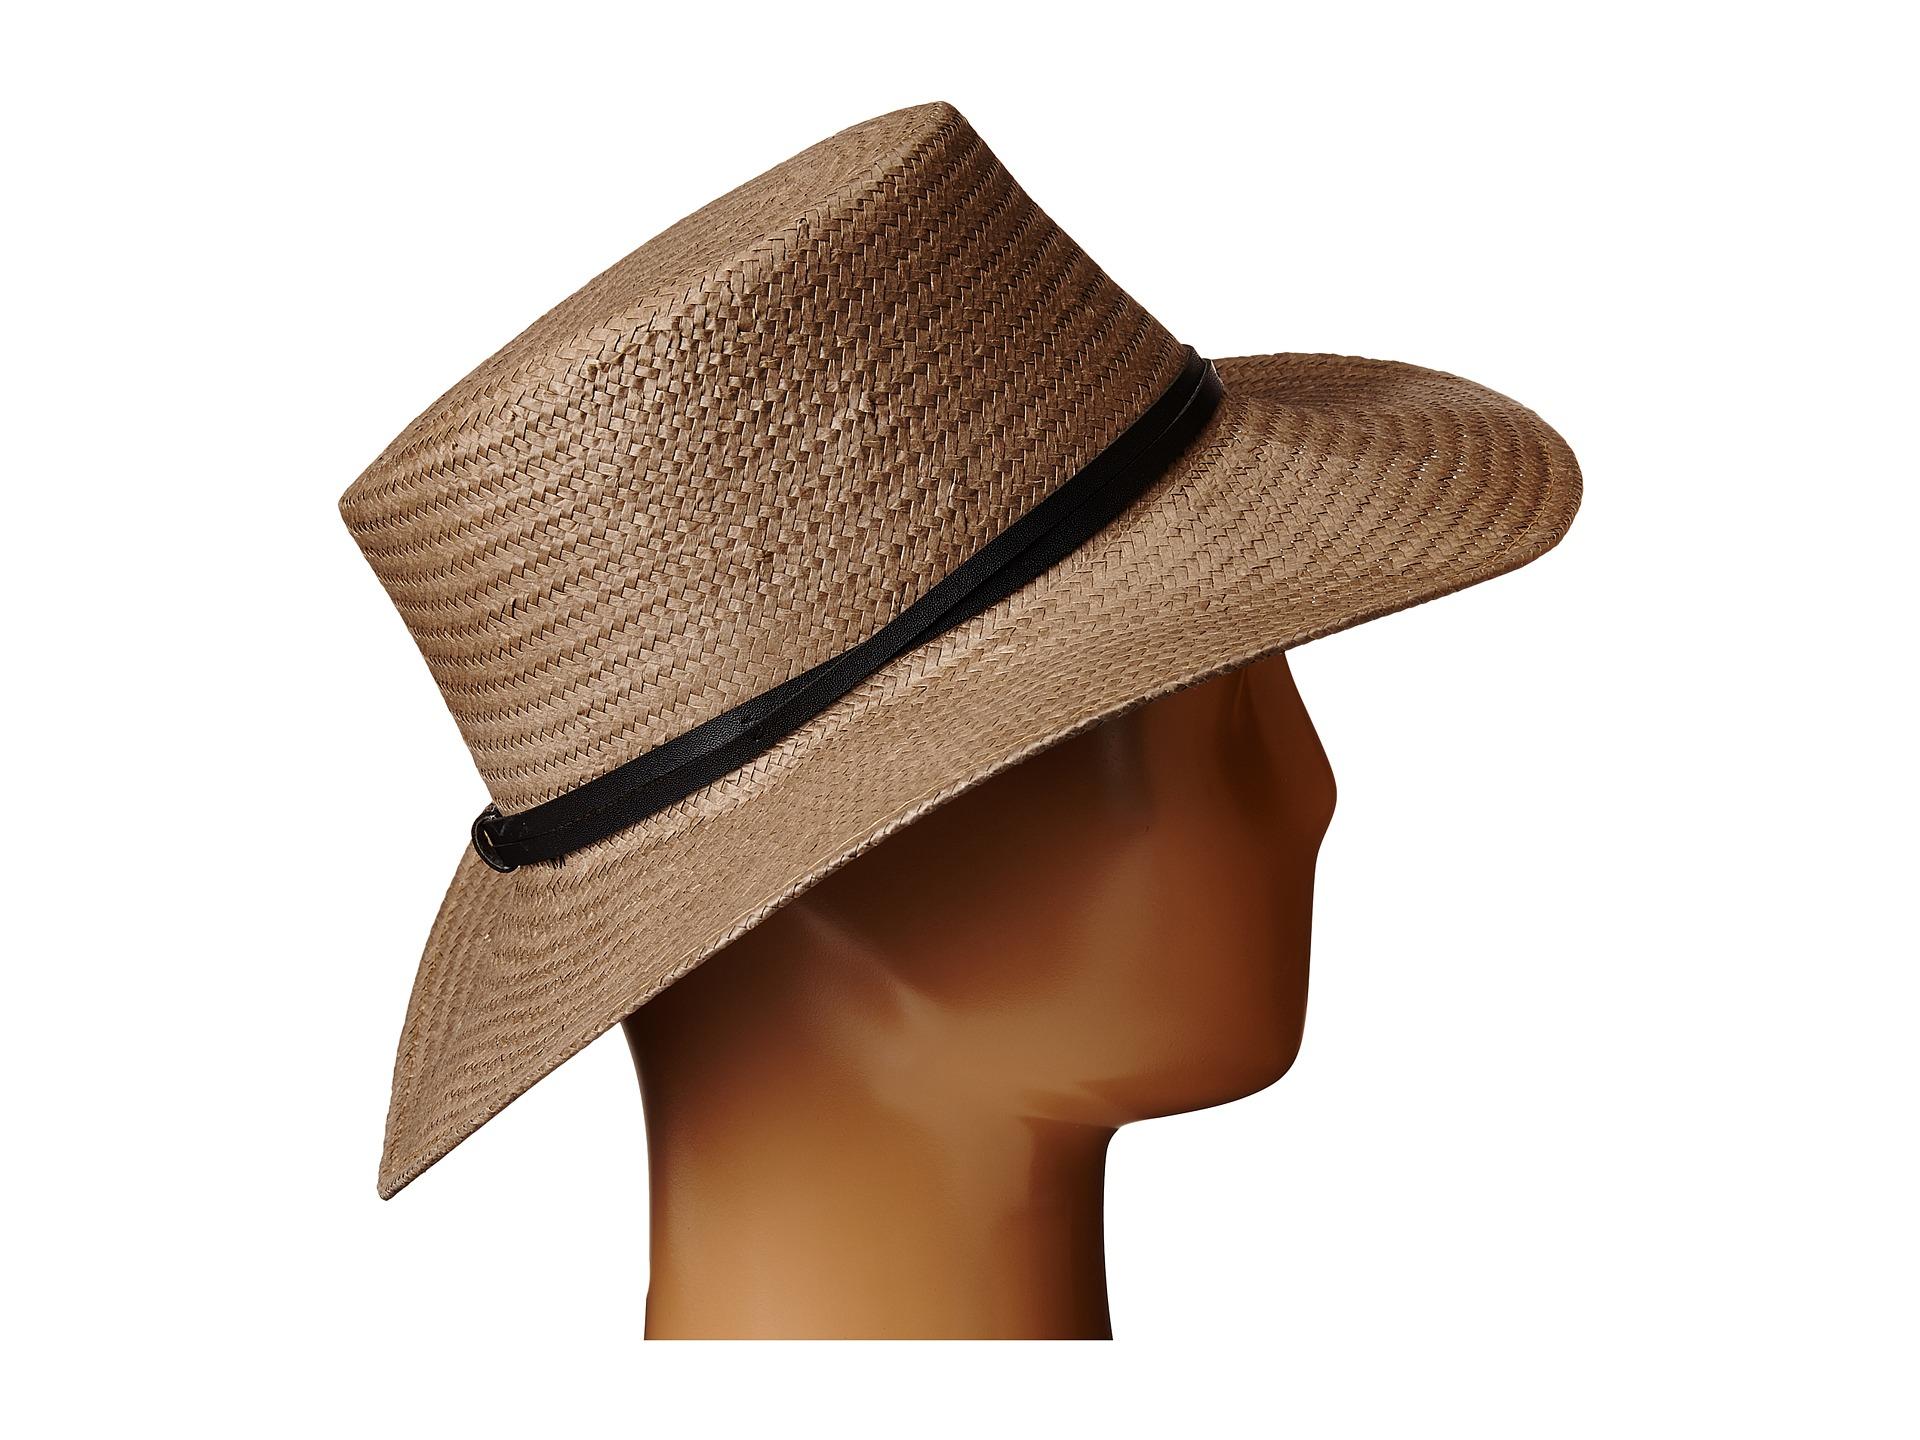 45b556bb9e1 Lyst - BCBGeneration Spring Gaucho Hat in Brown